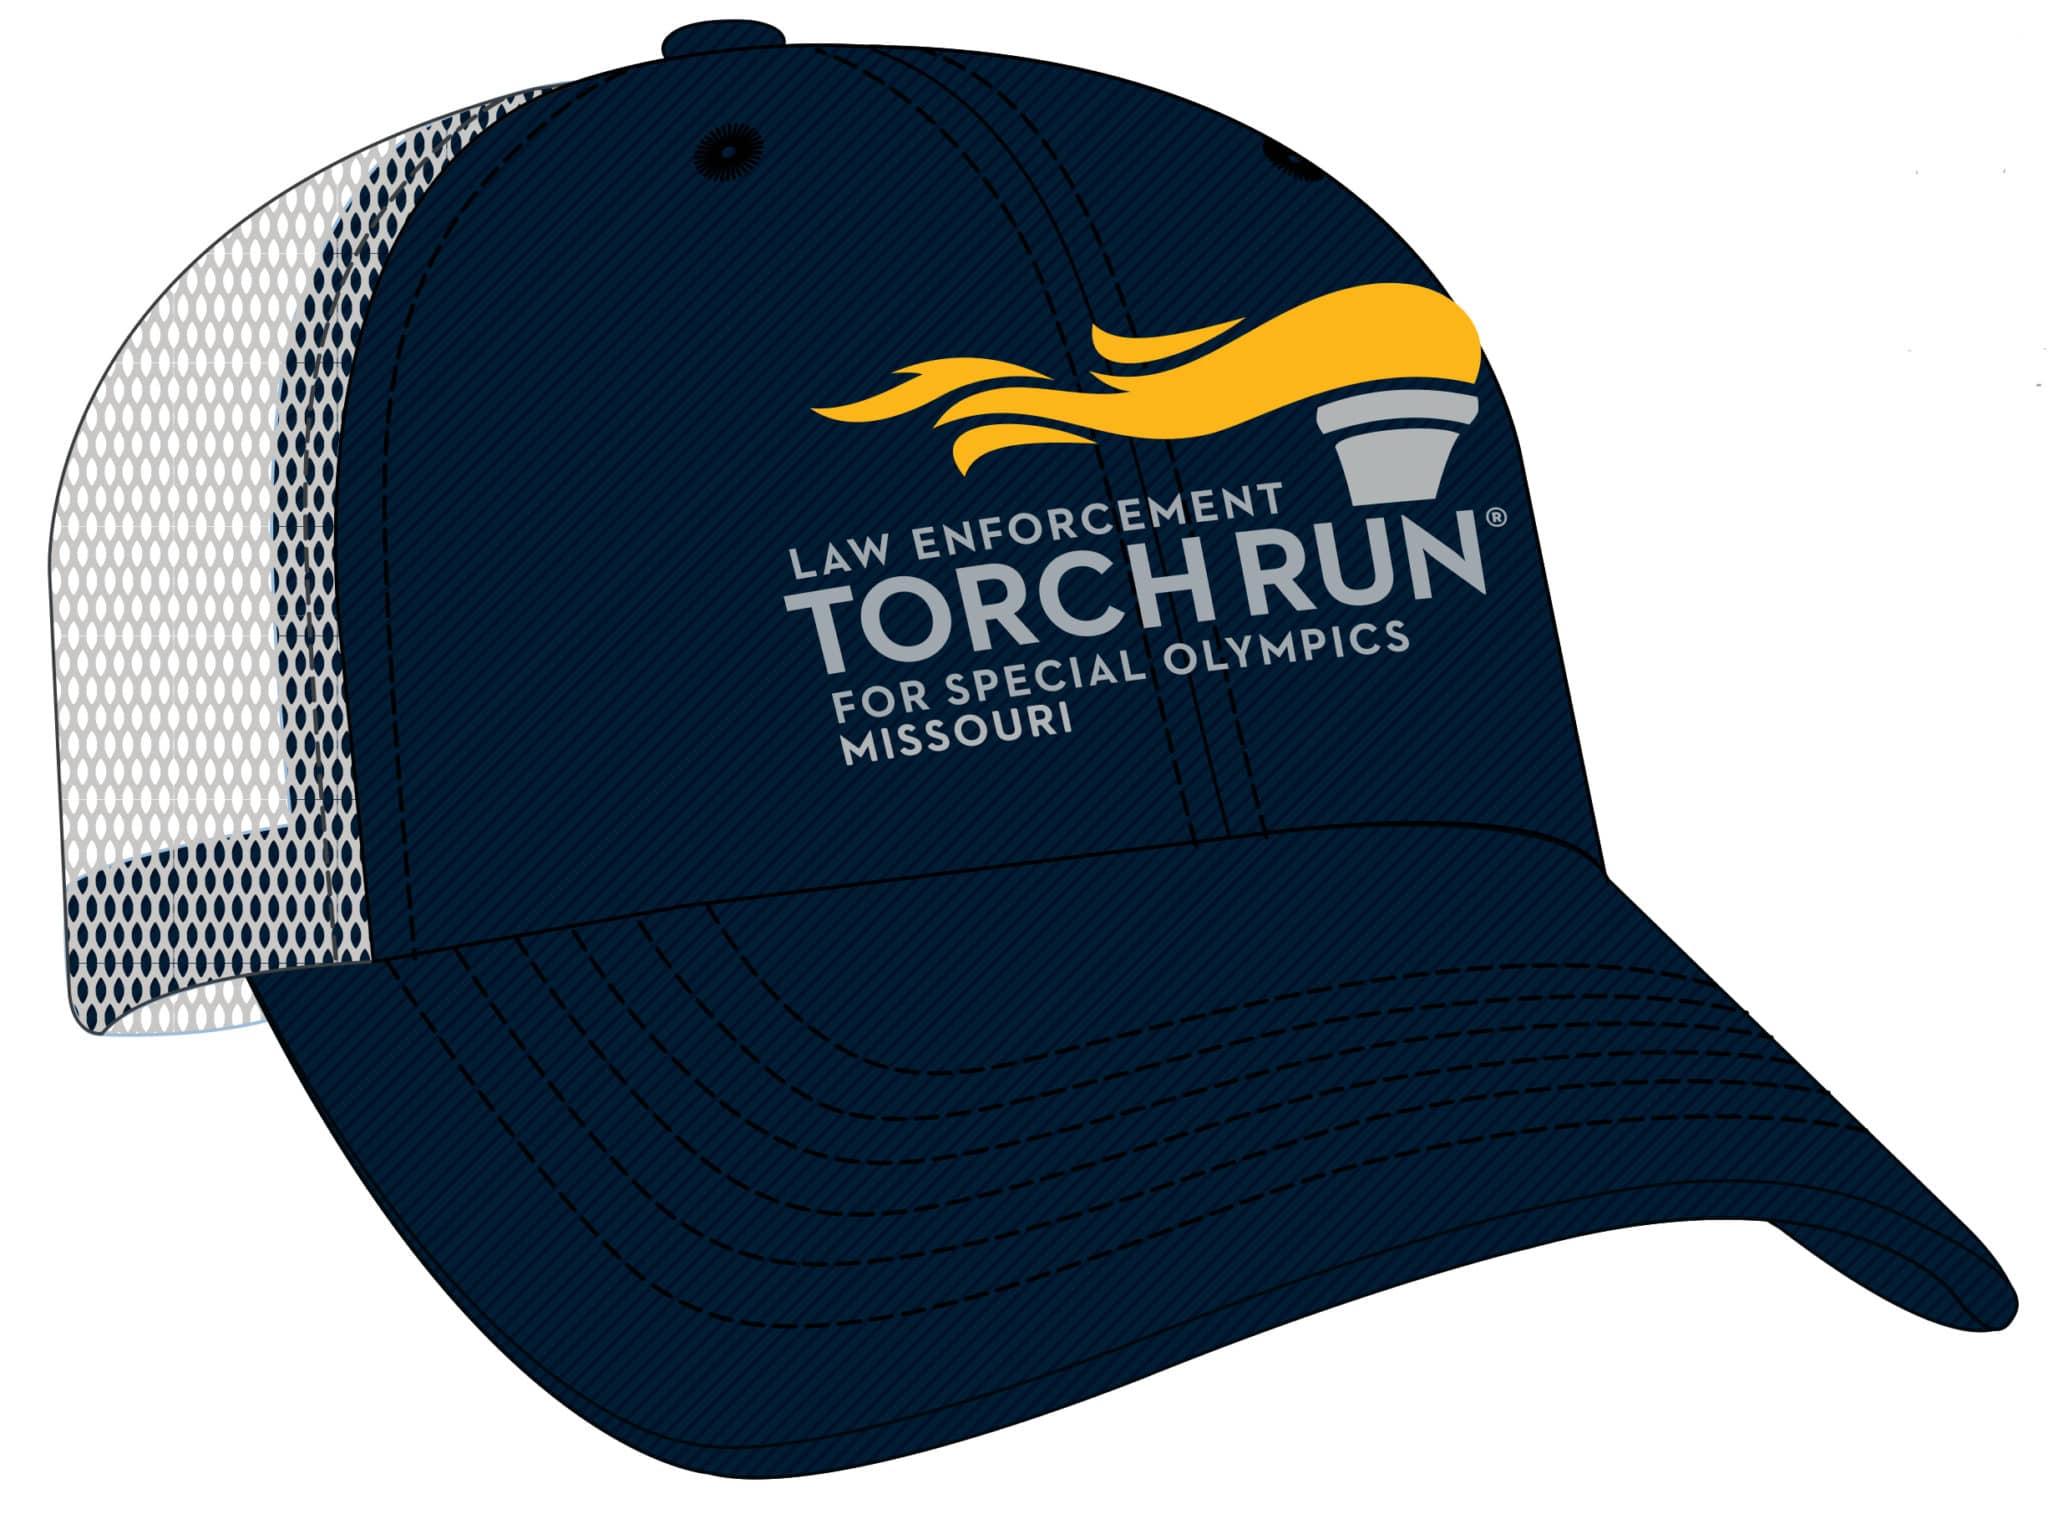 Dark blue hat with Law Enforcement Torch Run logo on it